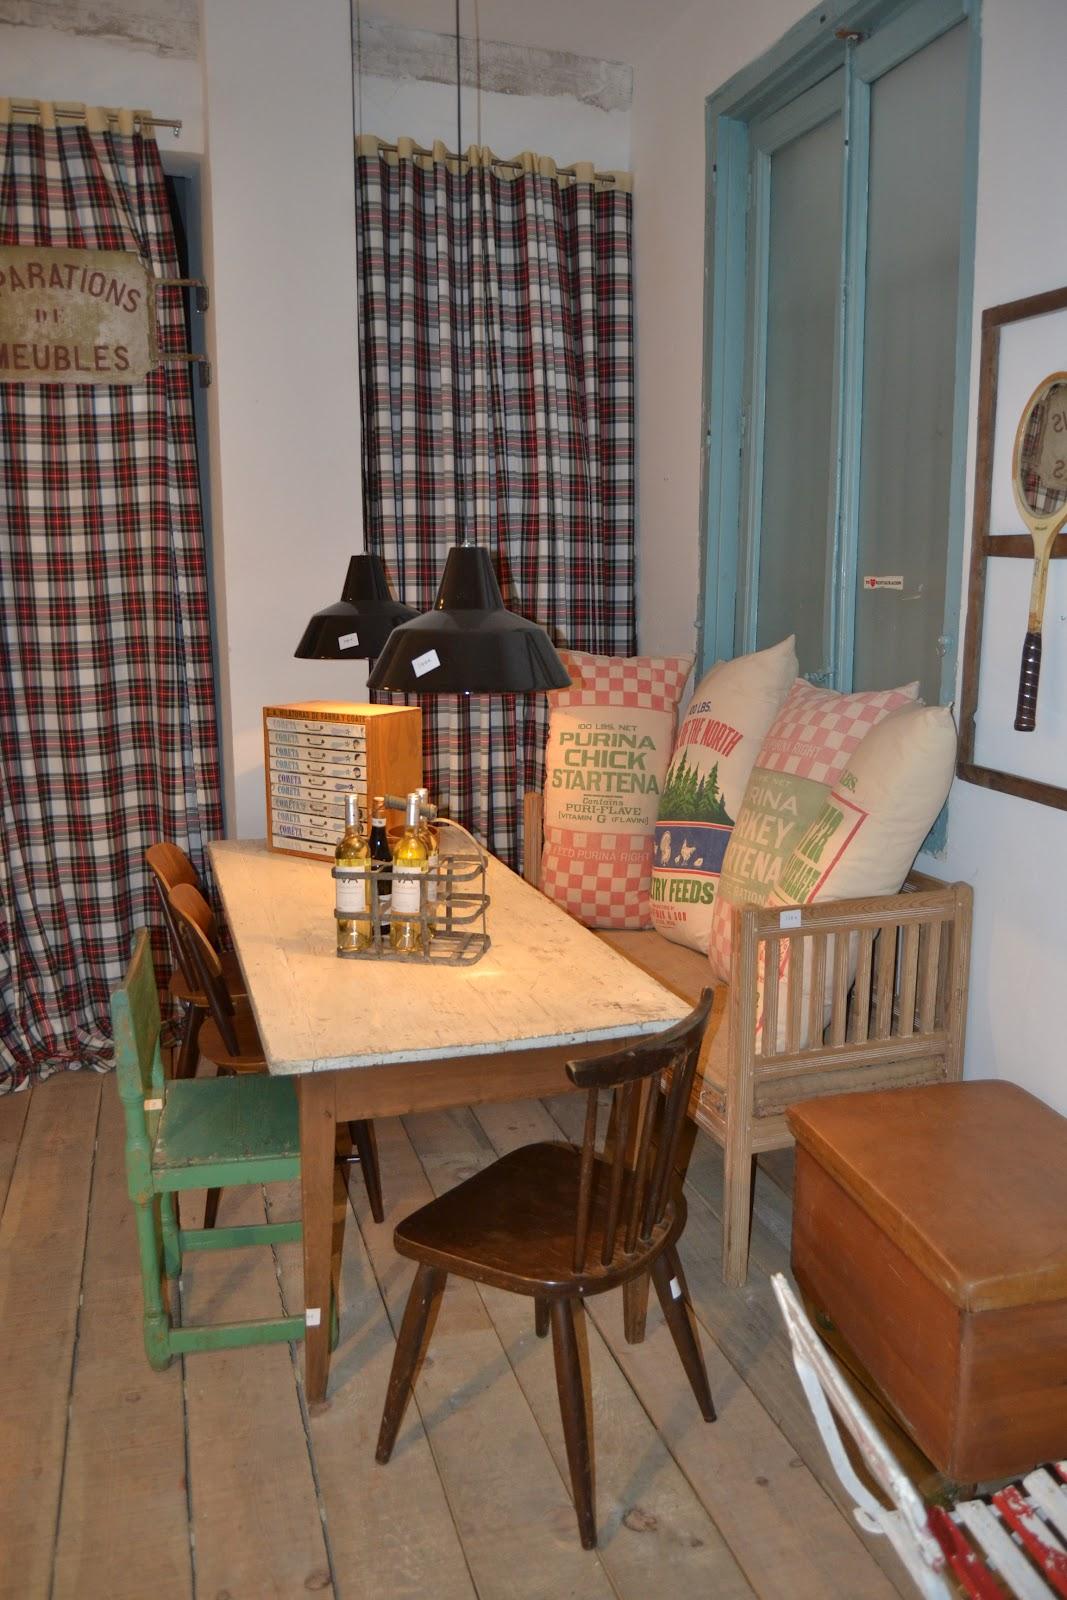 Events paseando por decoracci n 2012 virlova style - Virlova style ...